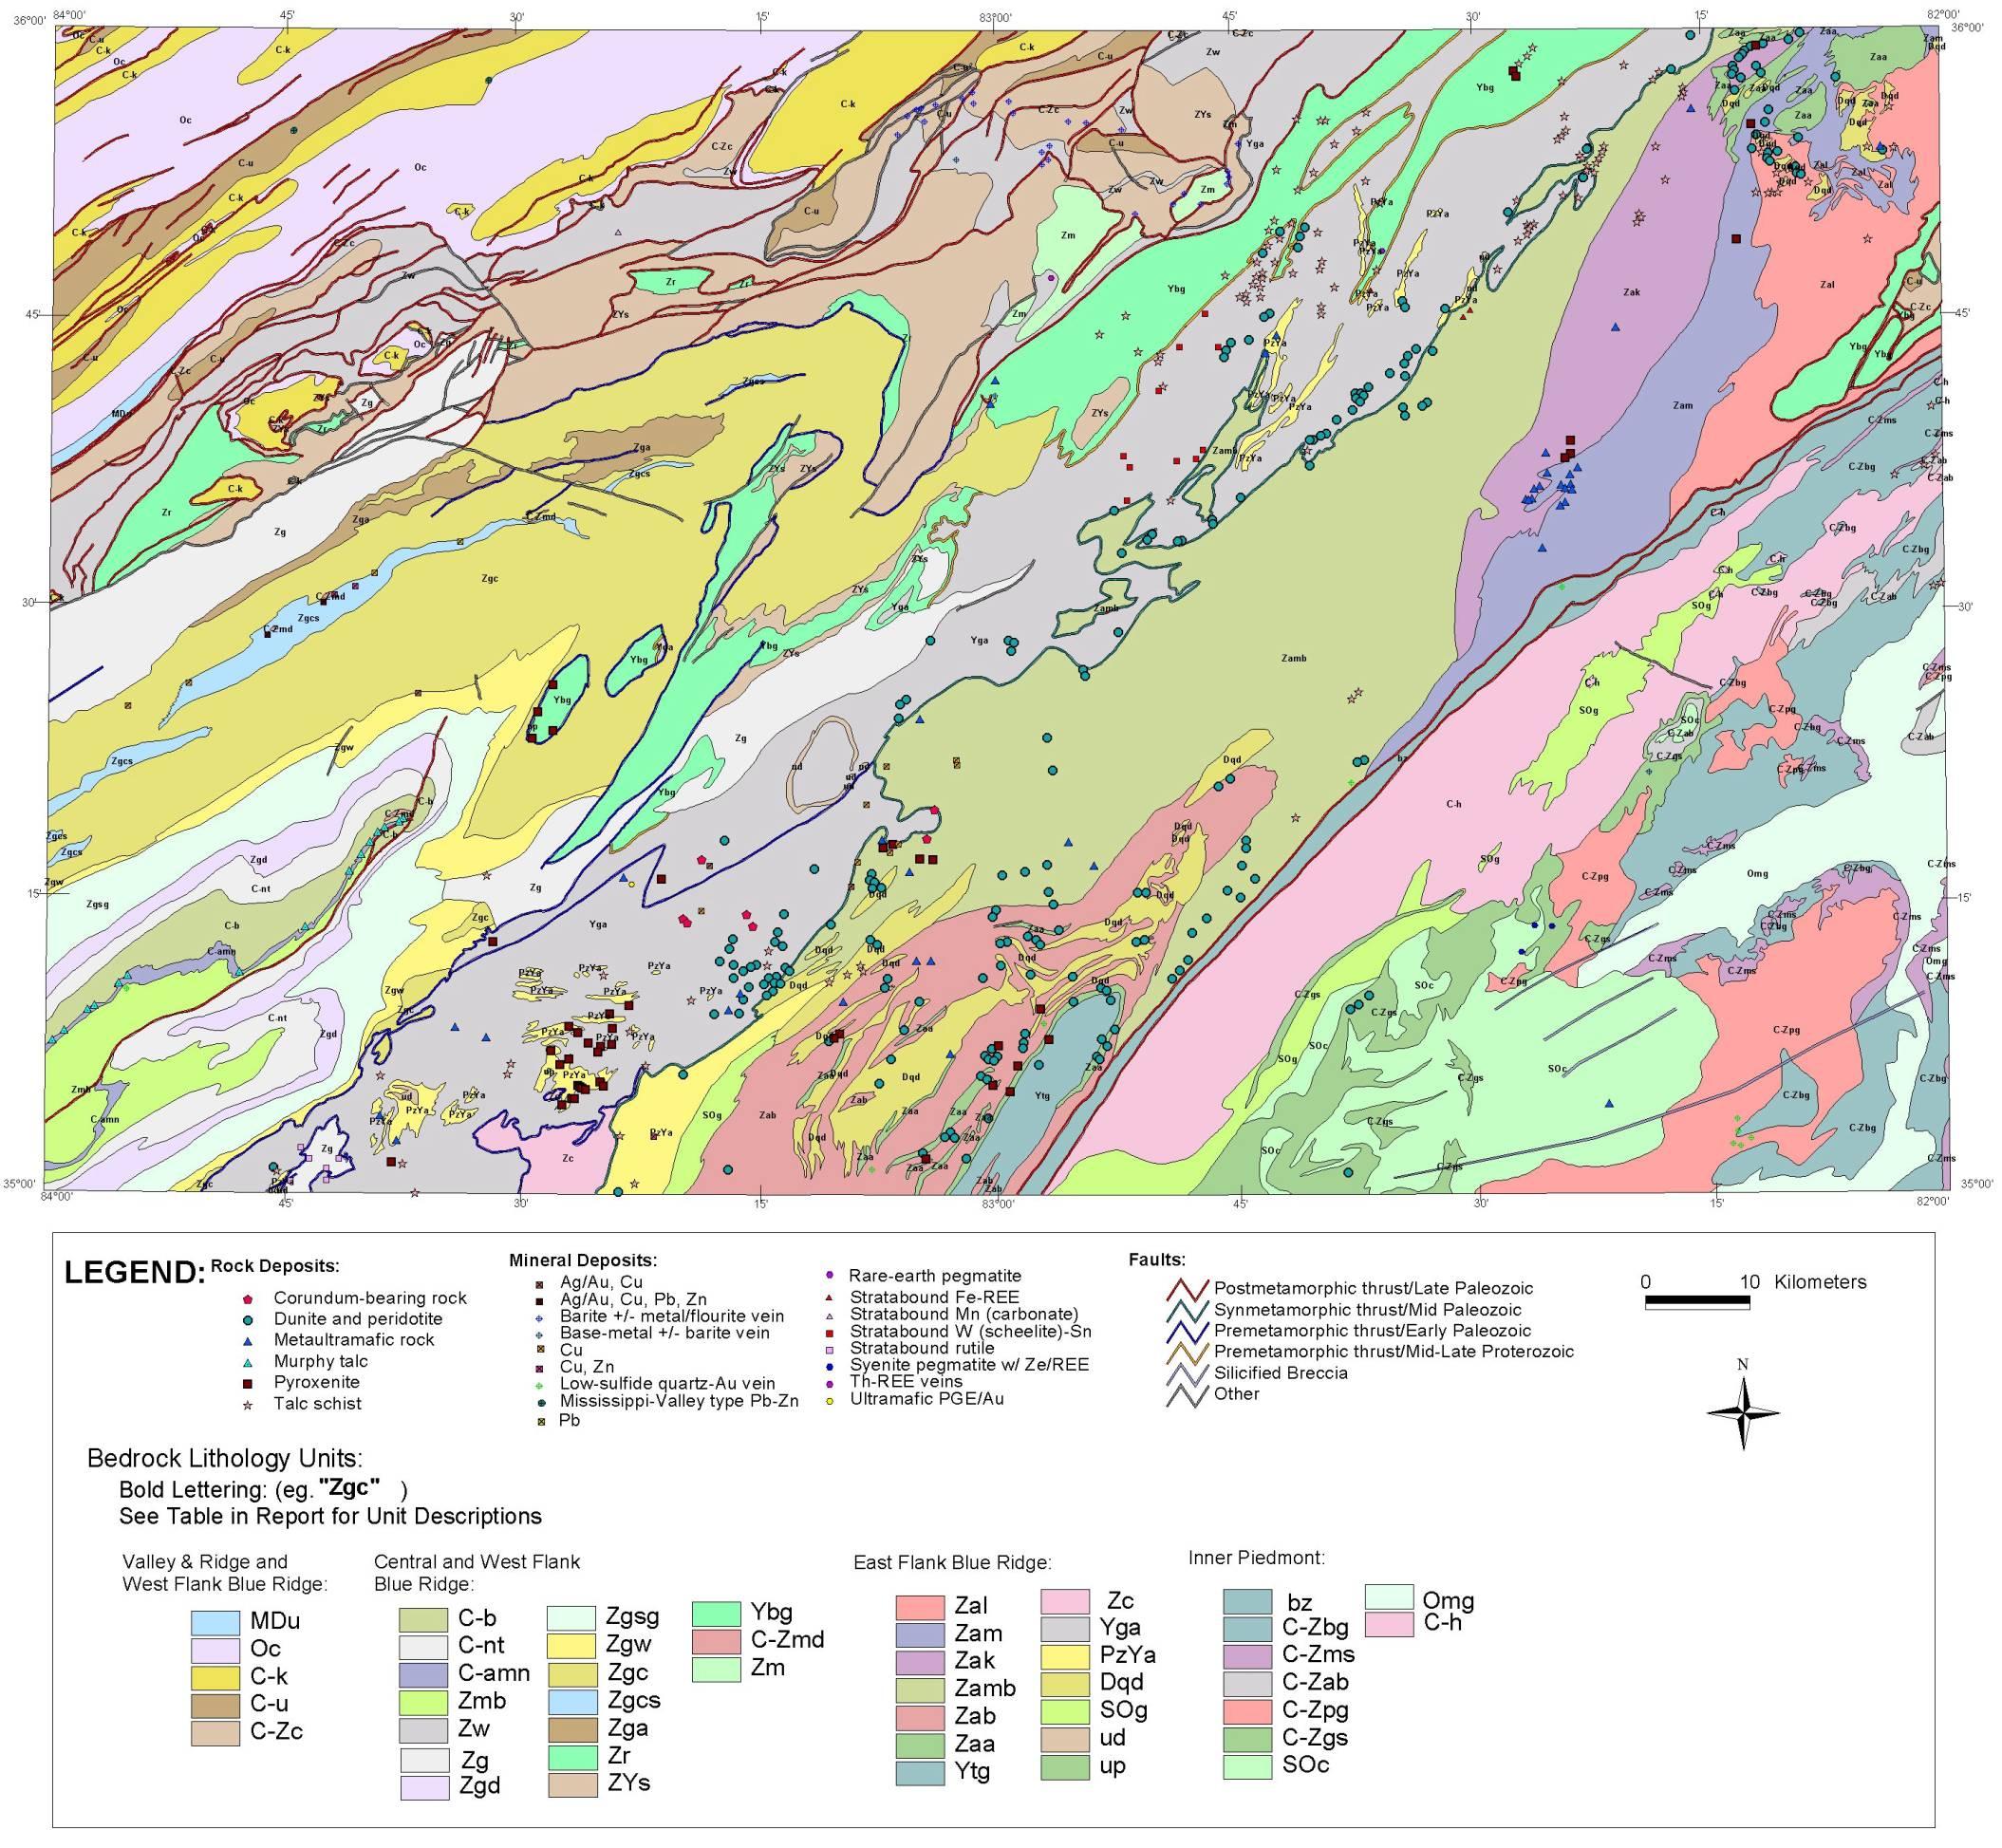 map image knoxville quadrangle - bedrock geology image